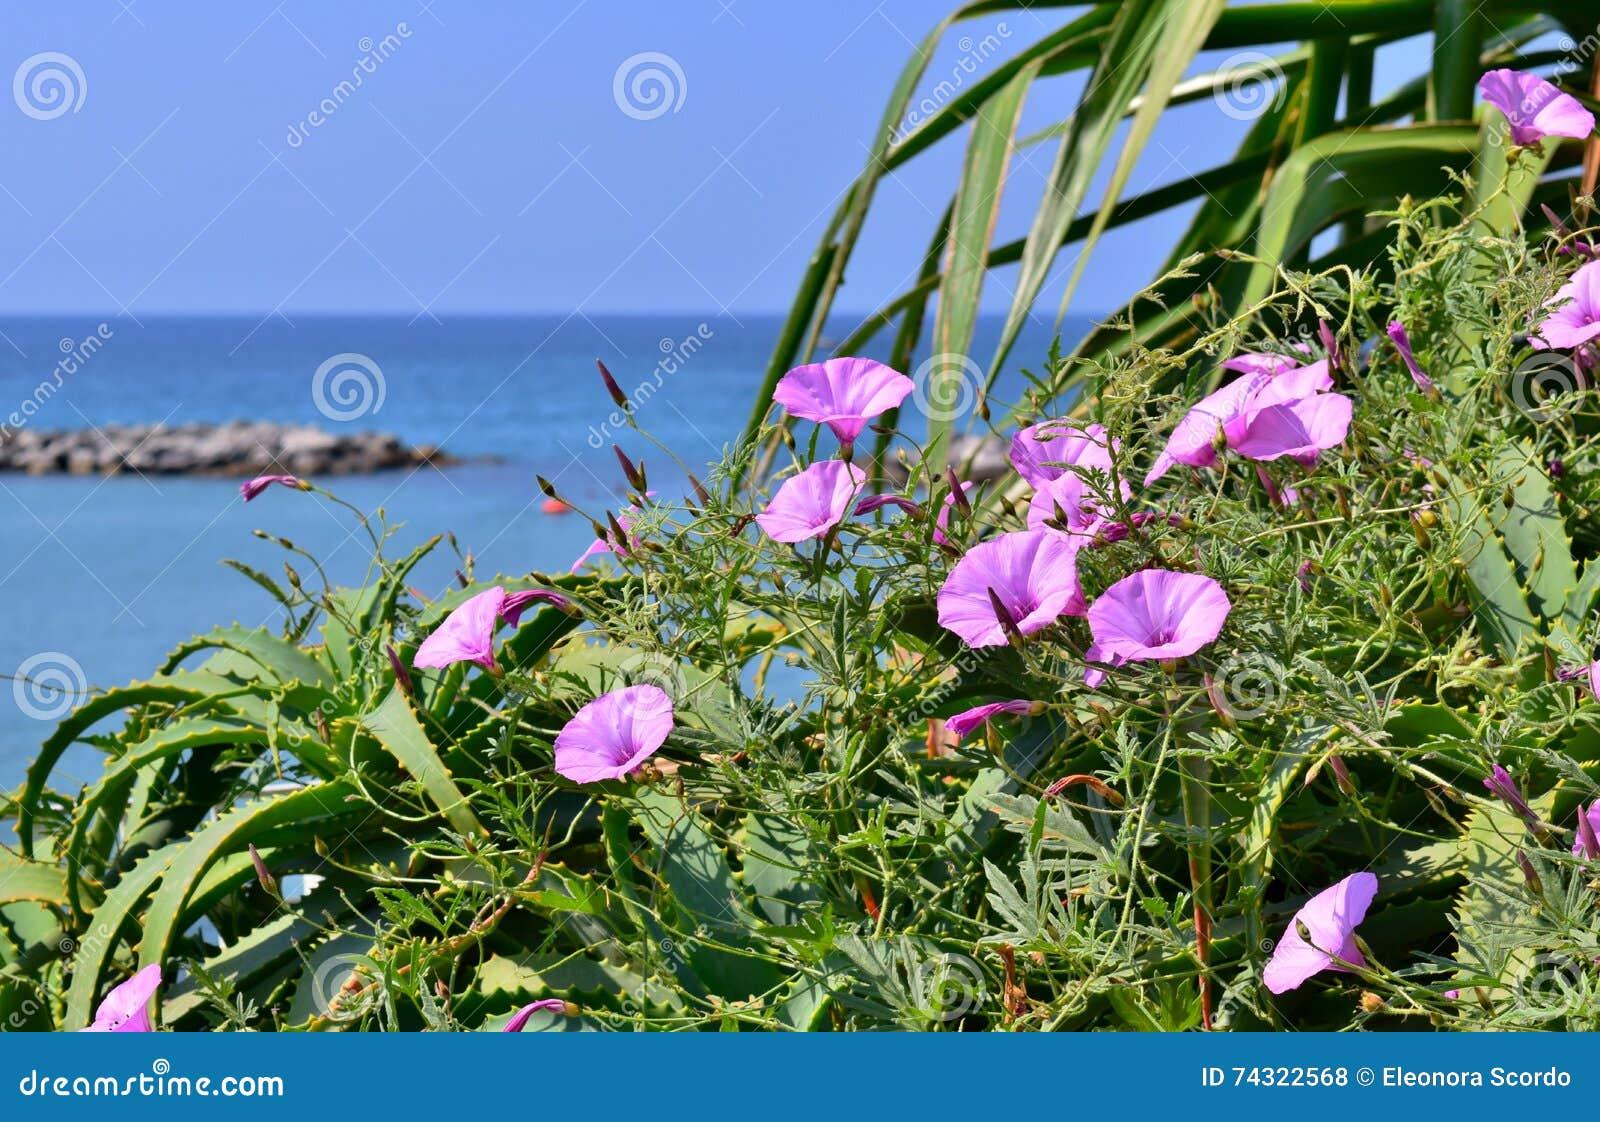 liseron rose de fleurs au bord de la mer photo stock - image: 74322568